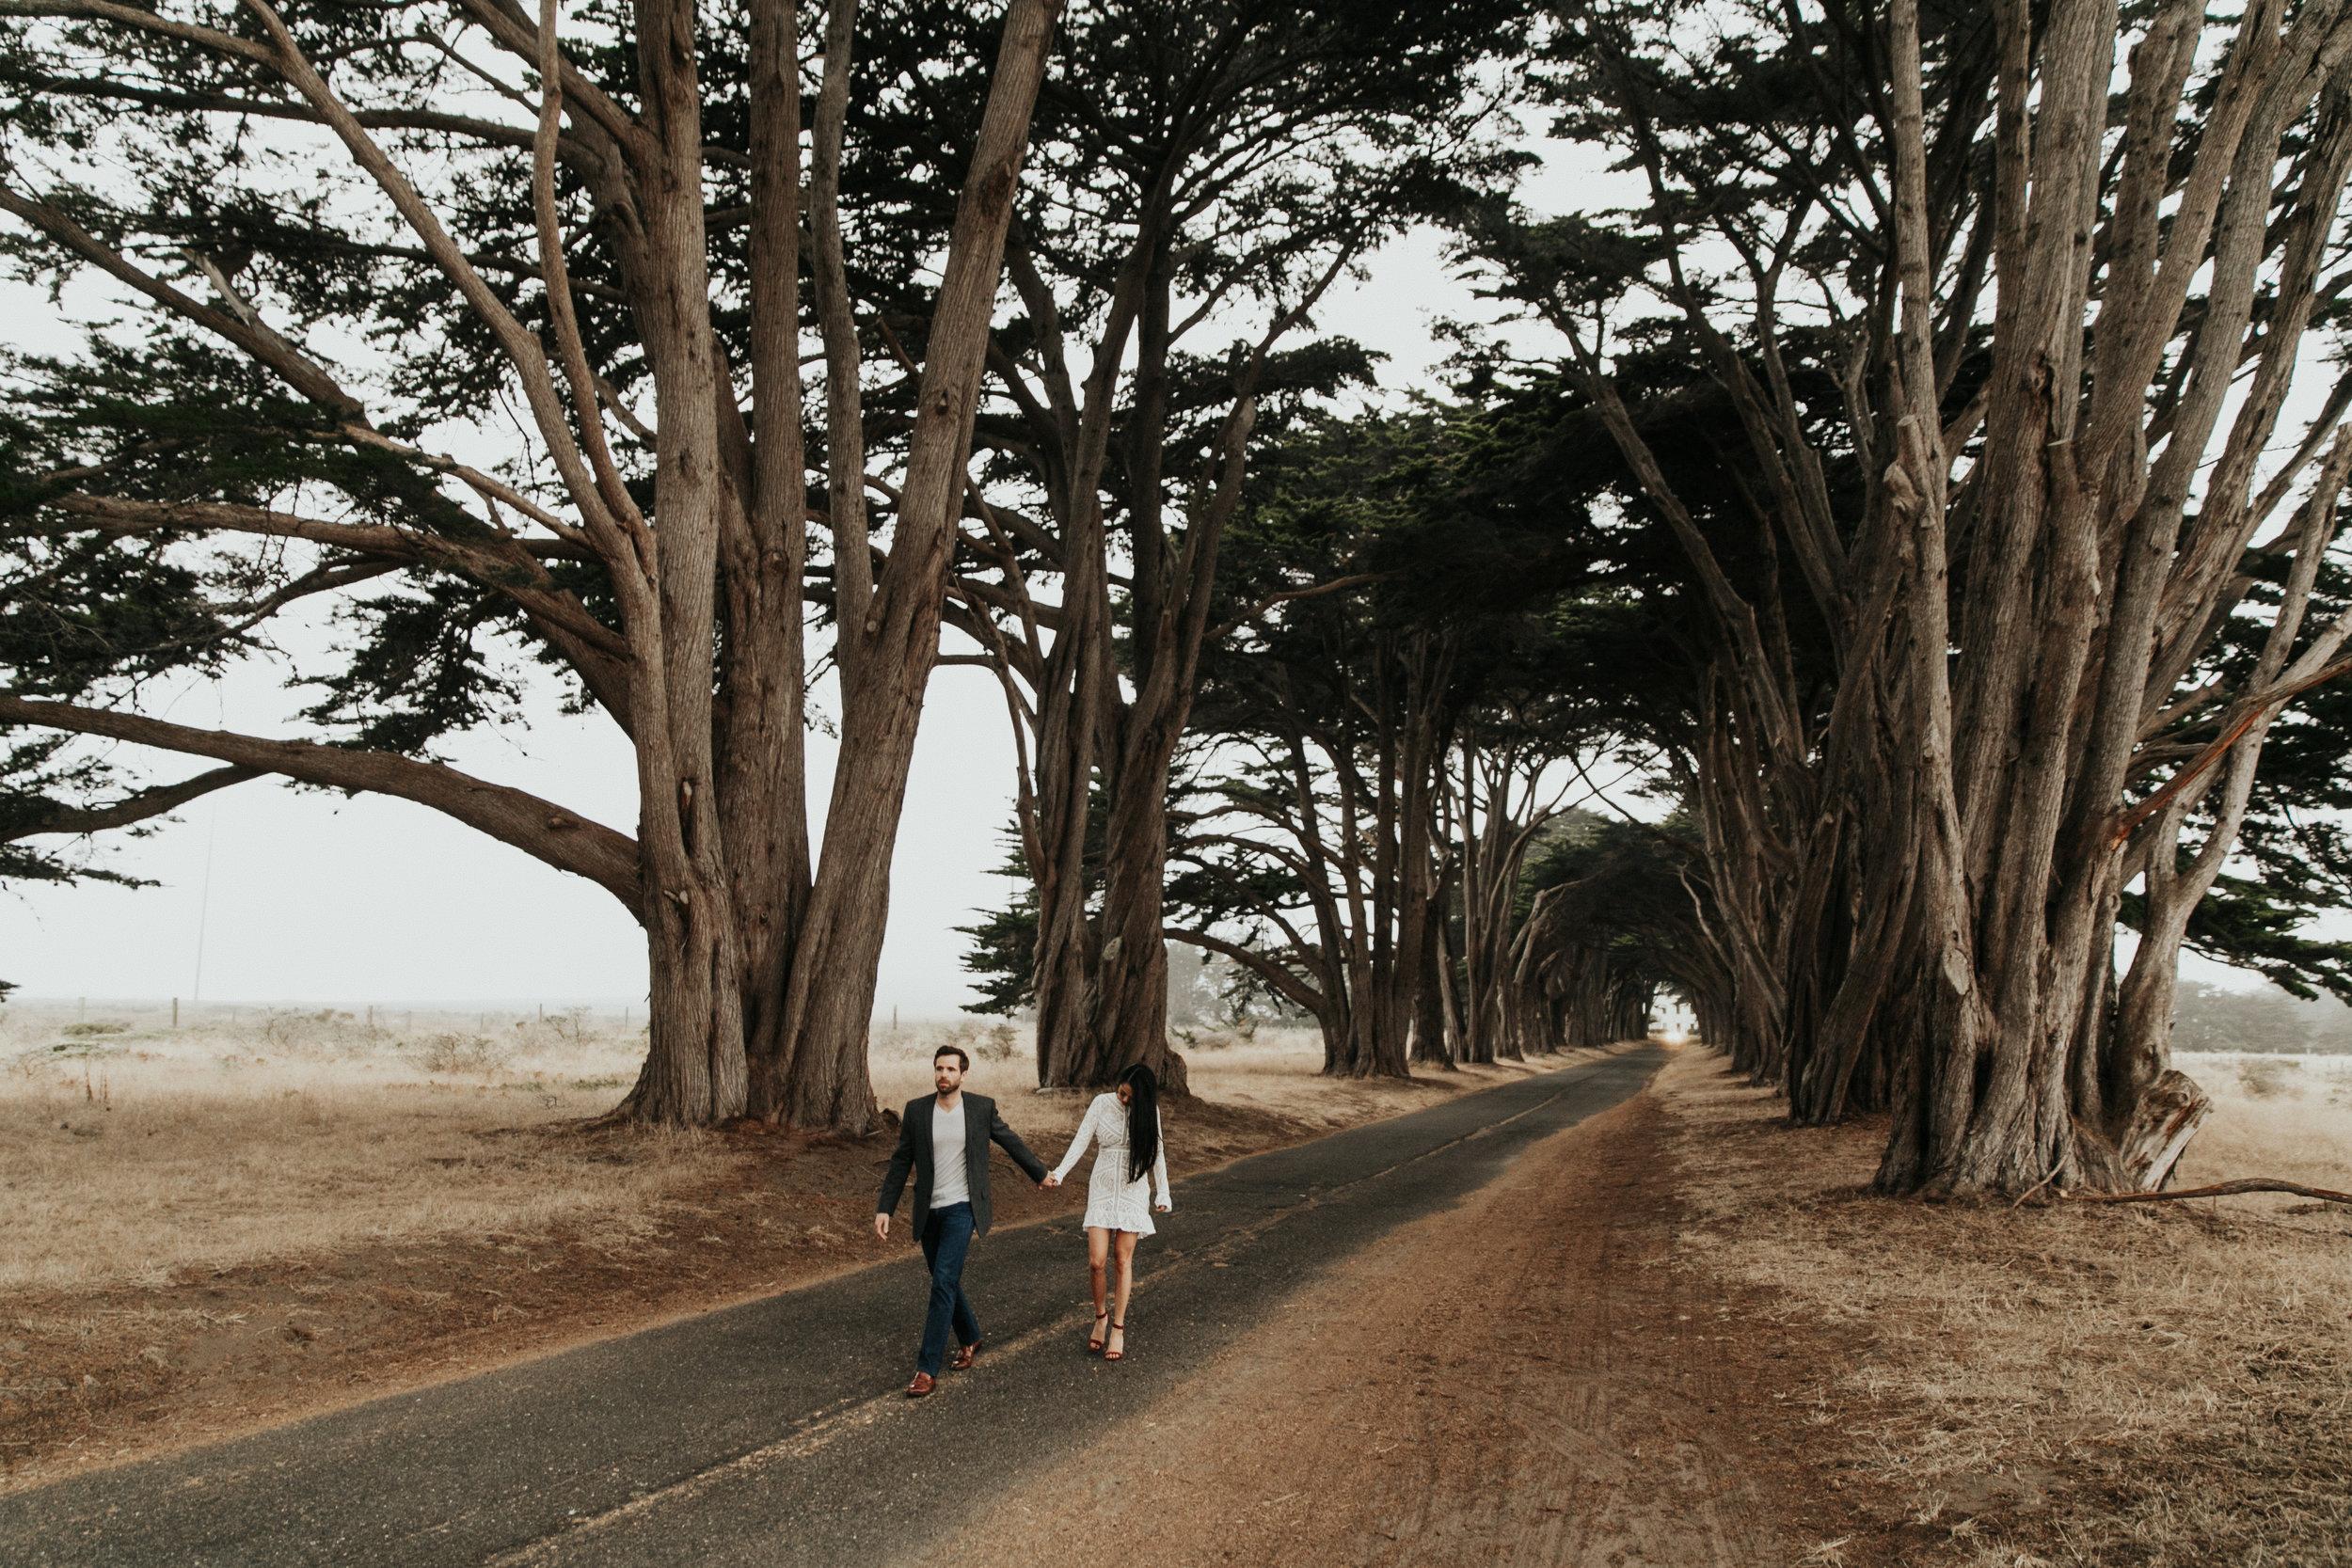 San_Francisco_Engagements_Melissa_Marshall-35.jpg